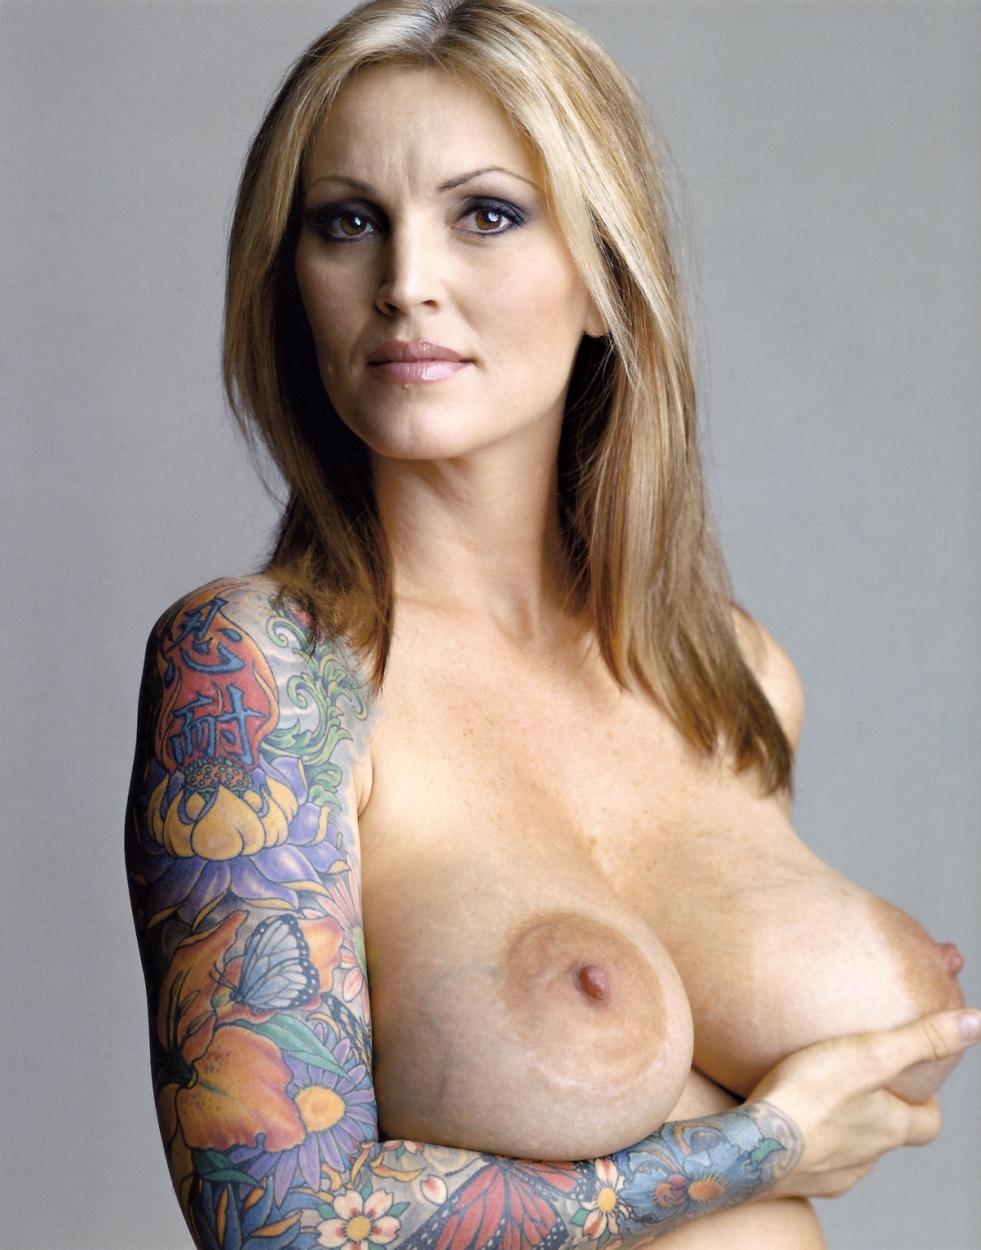 Women tits erotic image